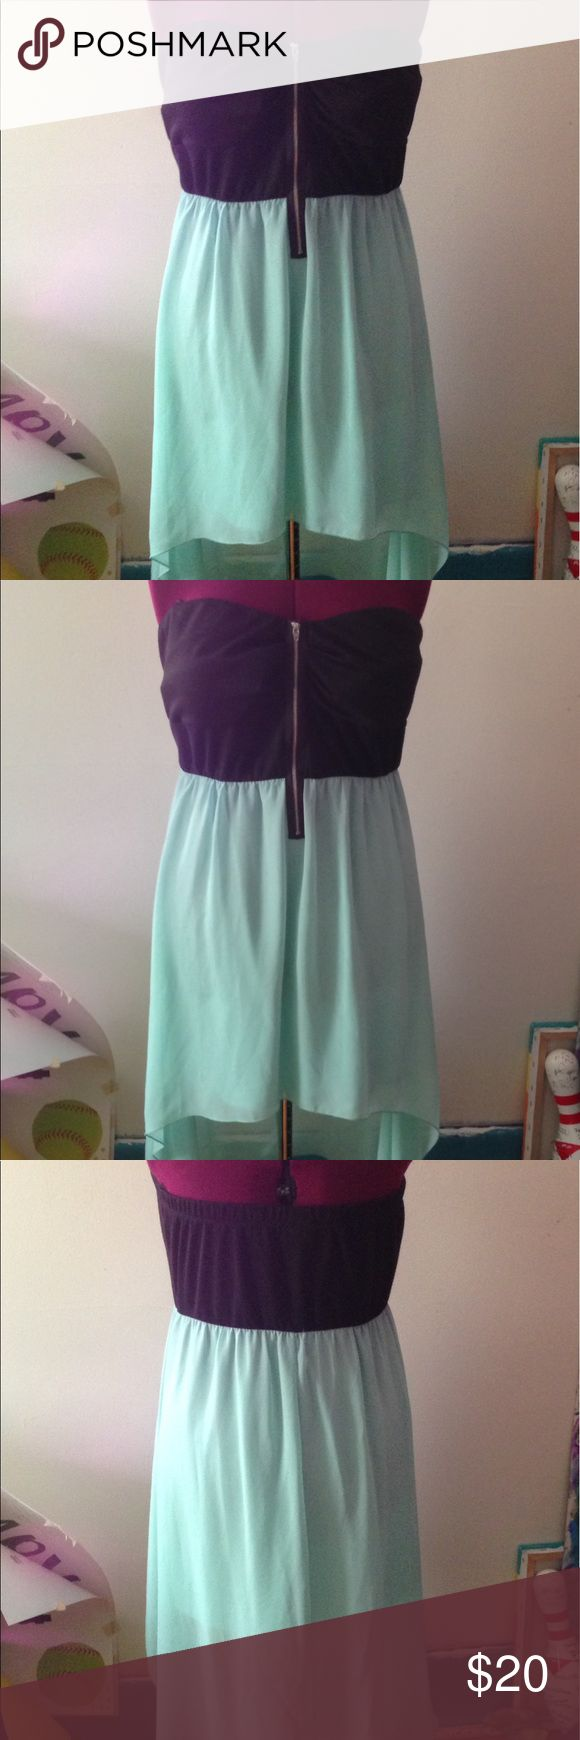 Deb Shops,  High Low Dress, Size 3X. Deb Shops,  High Low Black and Light Blue Dress, Size 3X. Dresses High Low